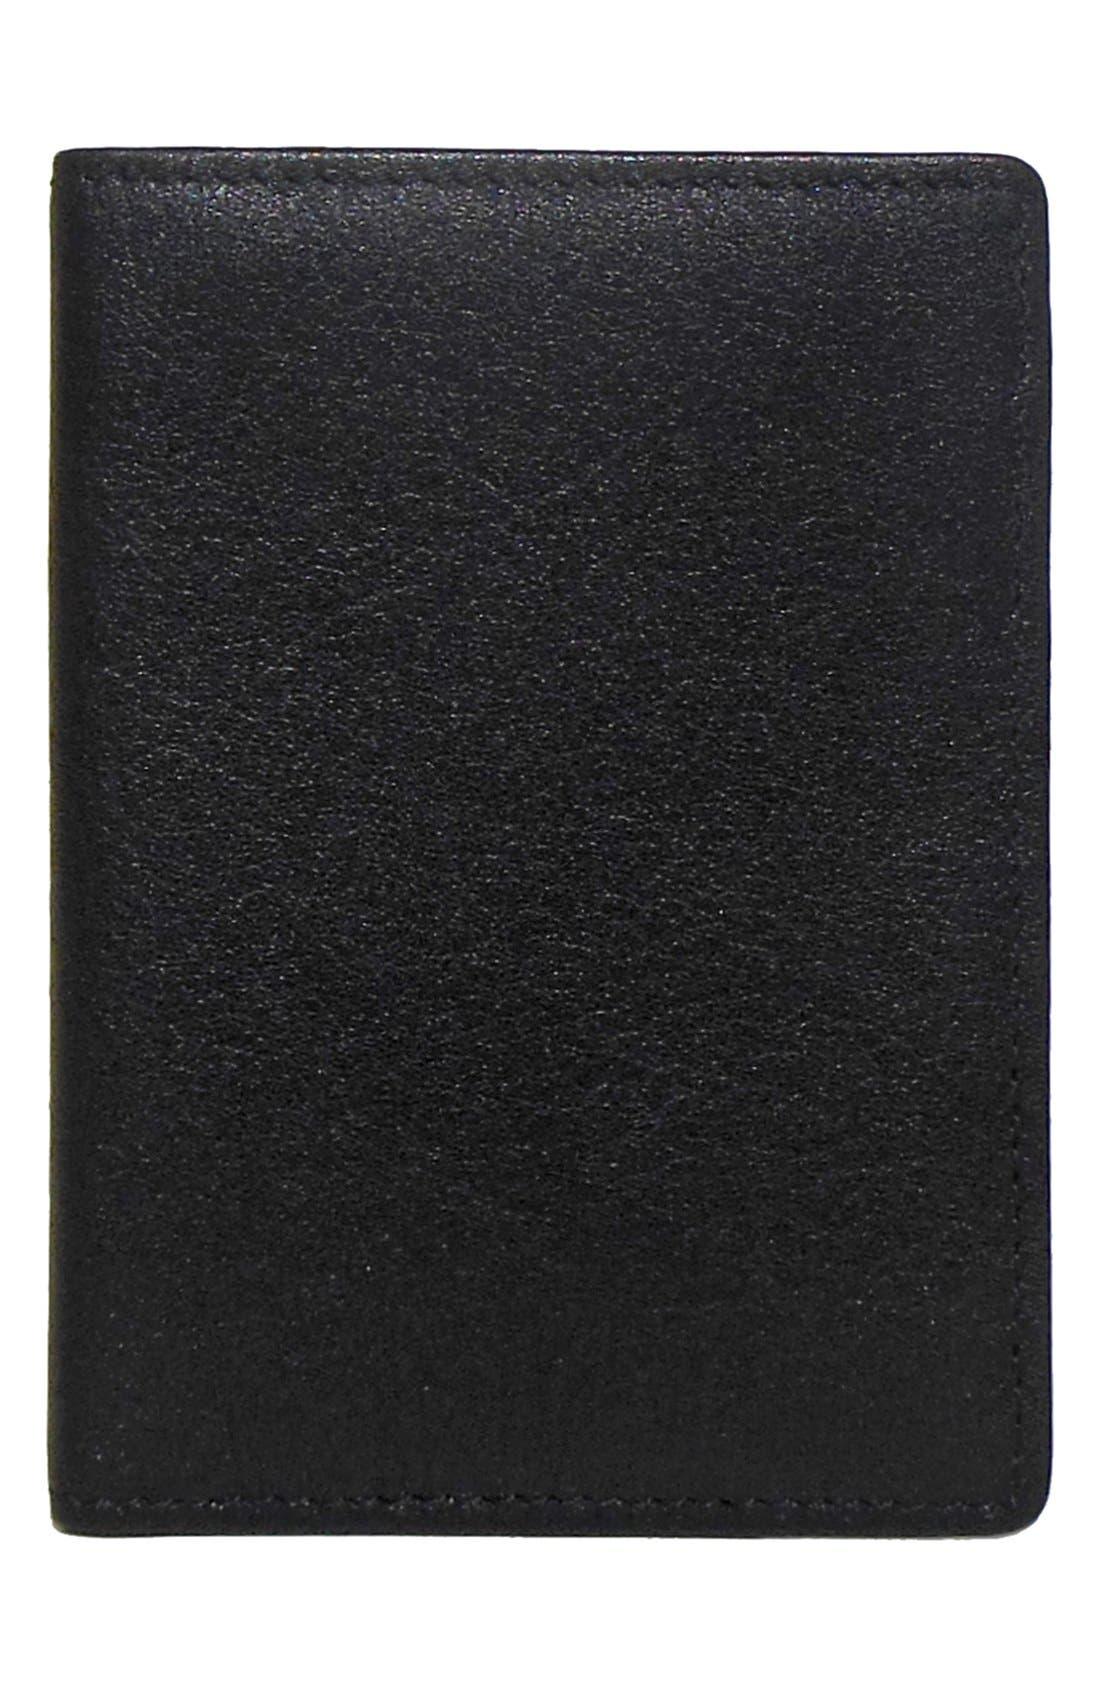 Alternate Image 1 Selected - Boconi 'George' RFID Blocker Slim Leather Card Case